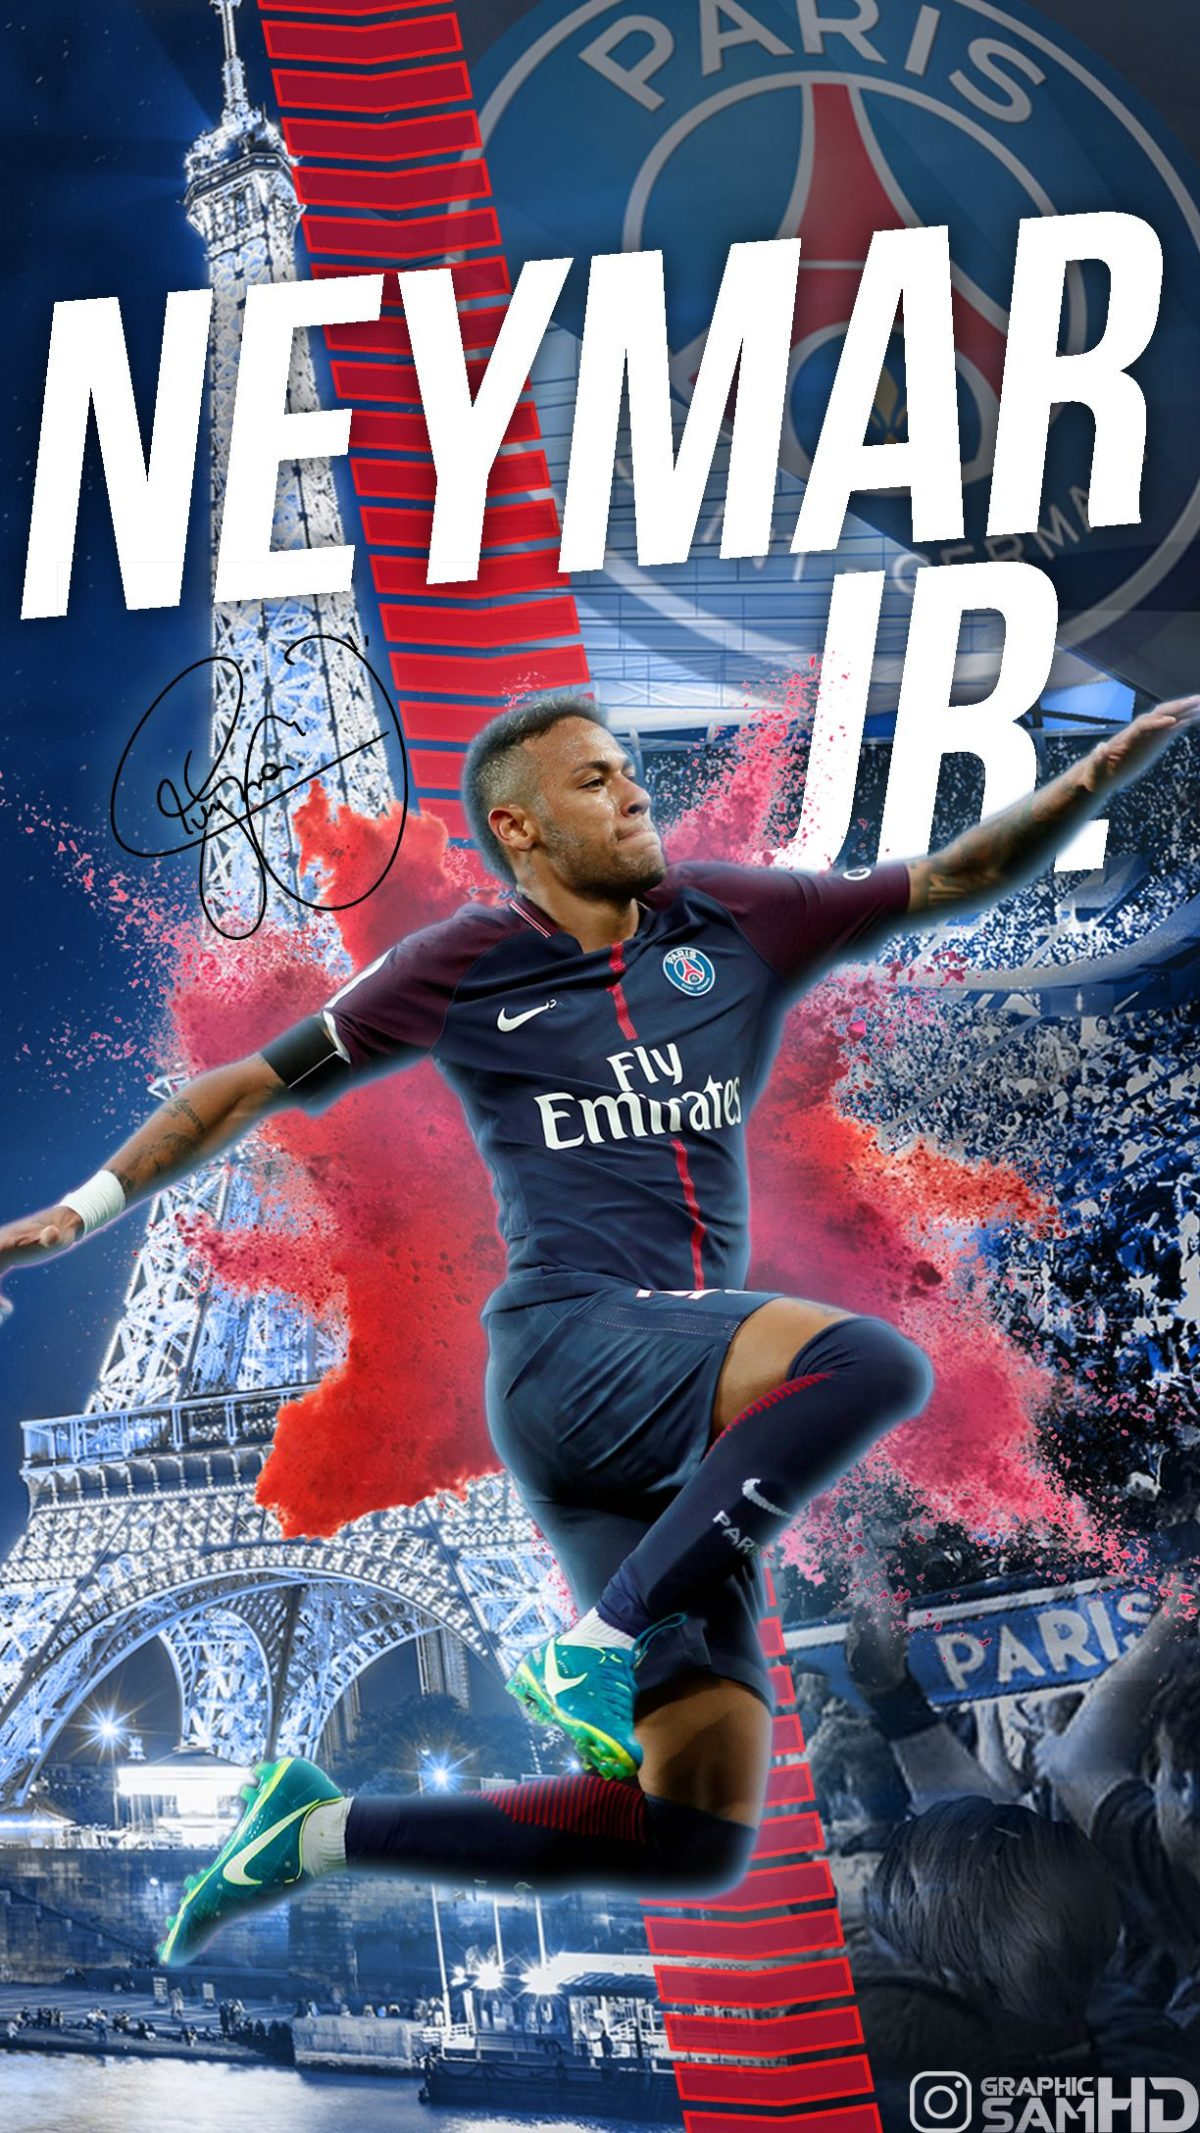 Neymar Jr PSG Phone wallpaper 2017/2018   Neymar jr   Pinterest …